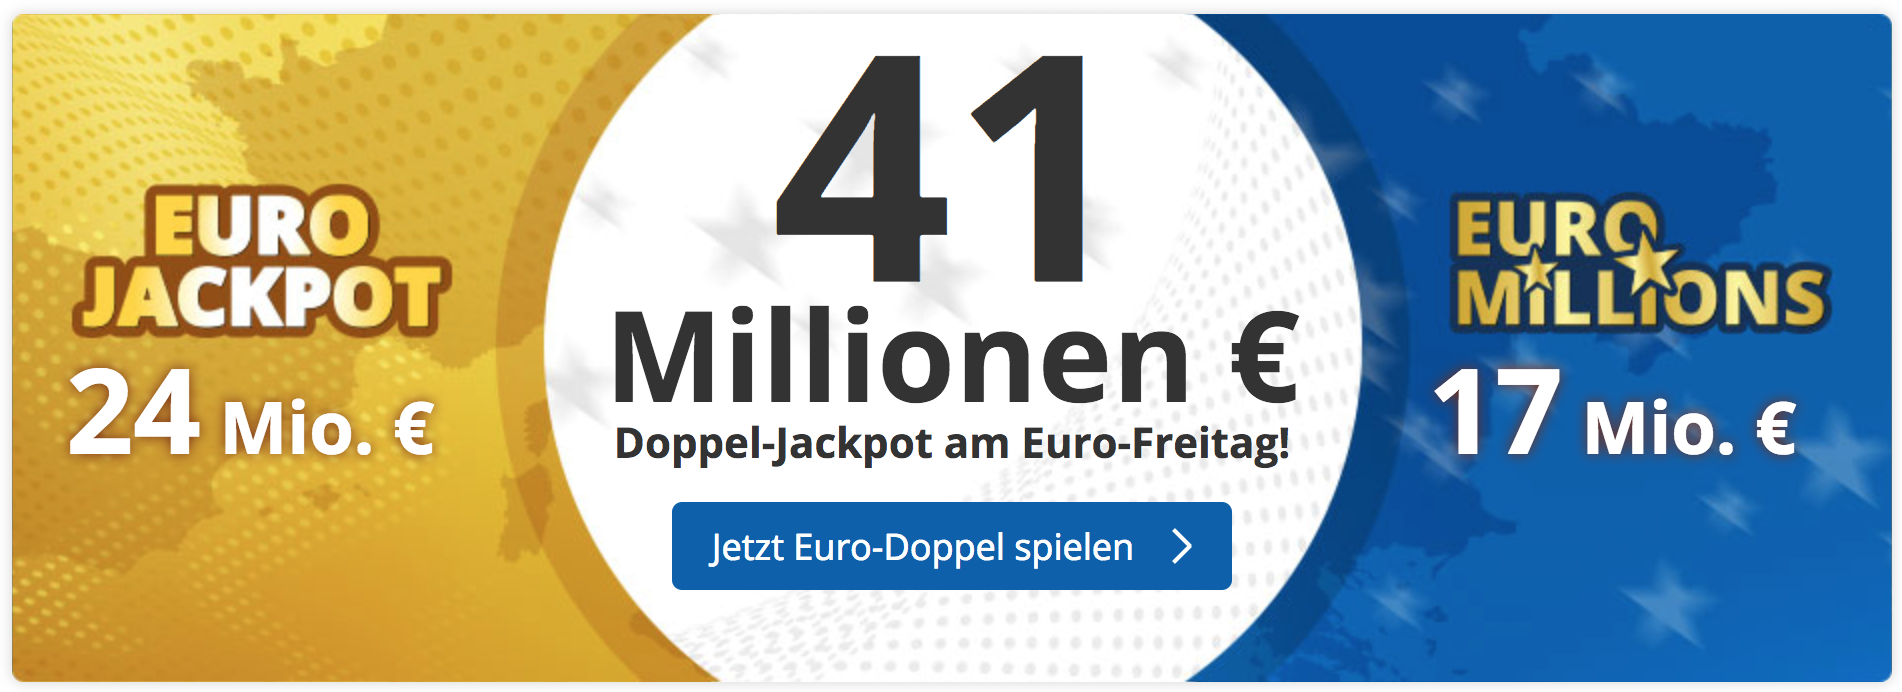 Eurojackpot 21.02 20